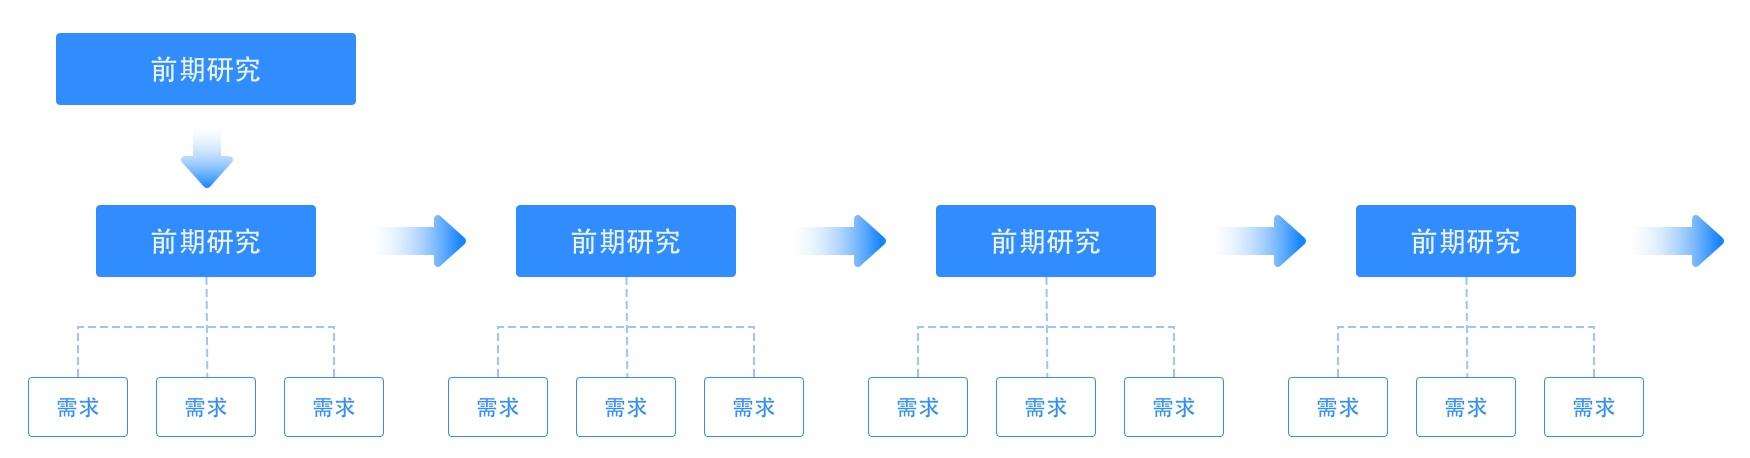 B端设计师怎样发挥设计价值?来看京东高手的总结!